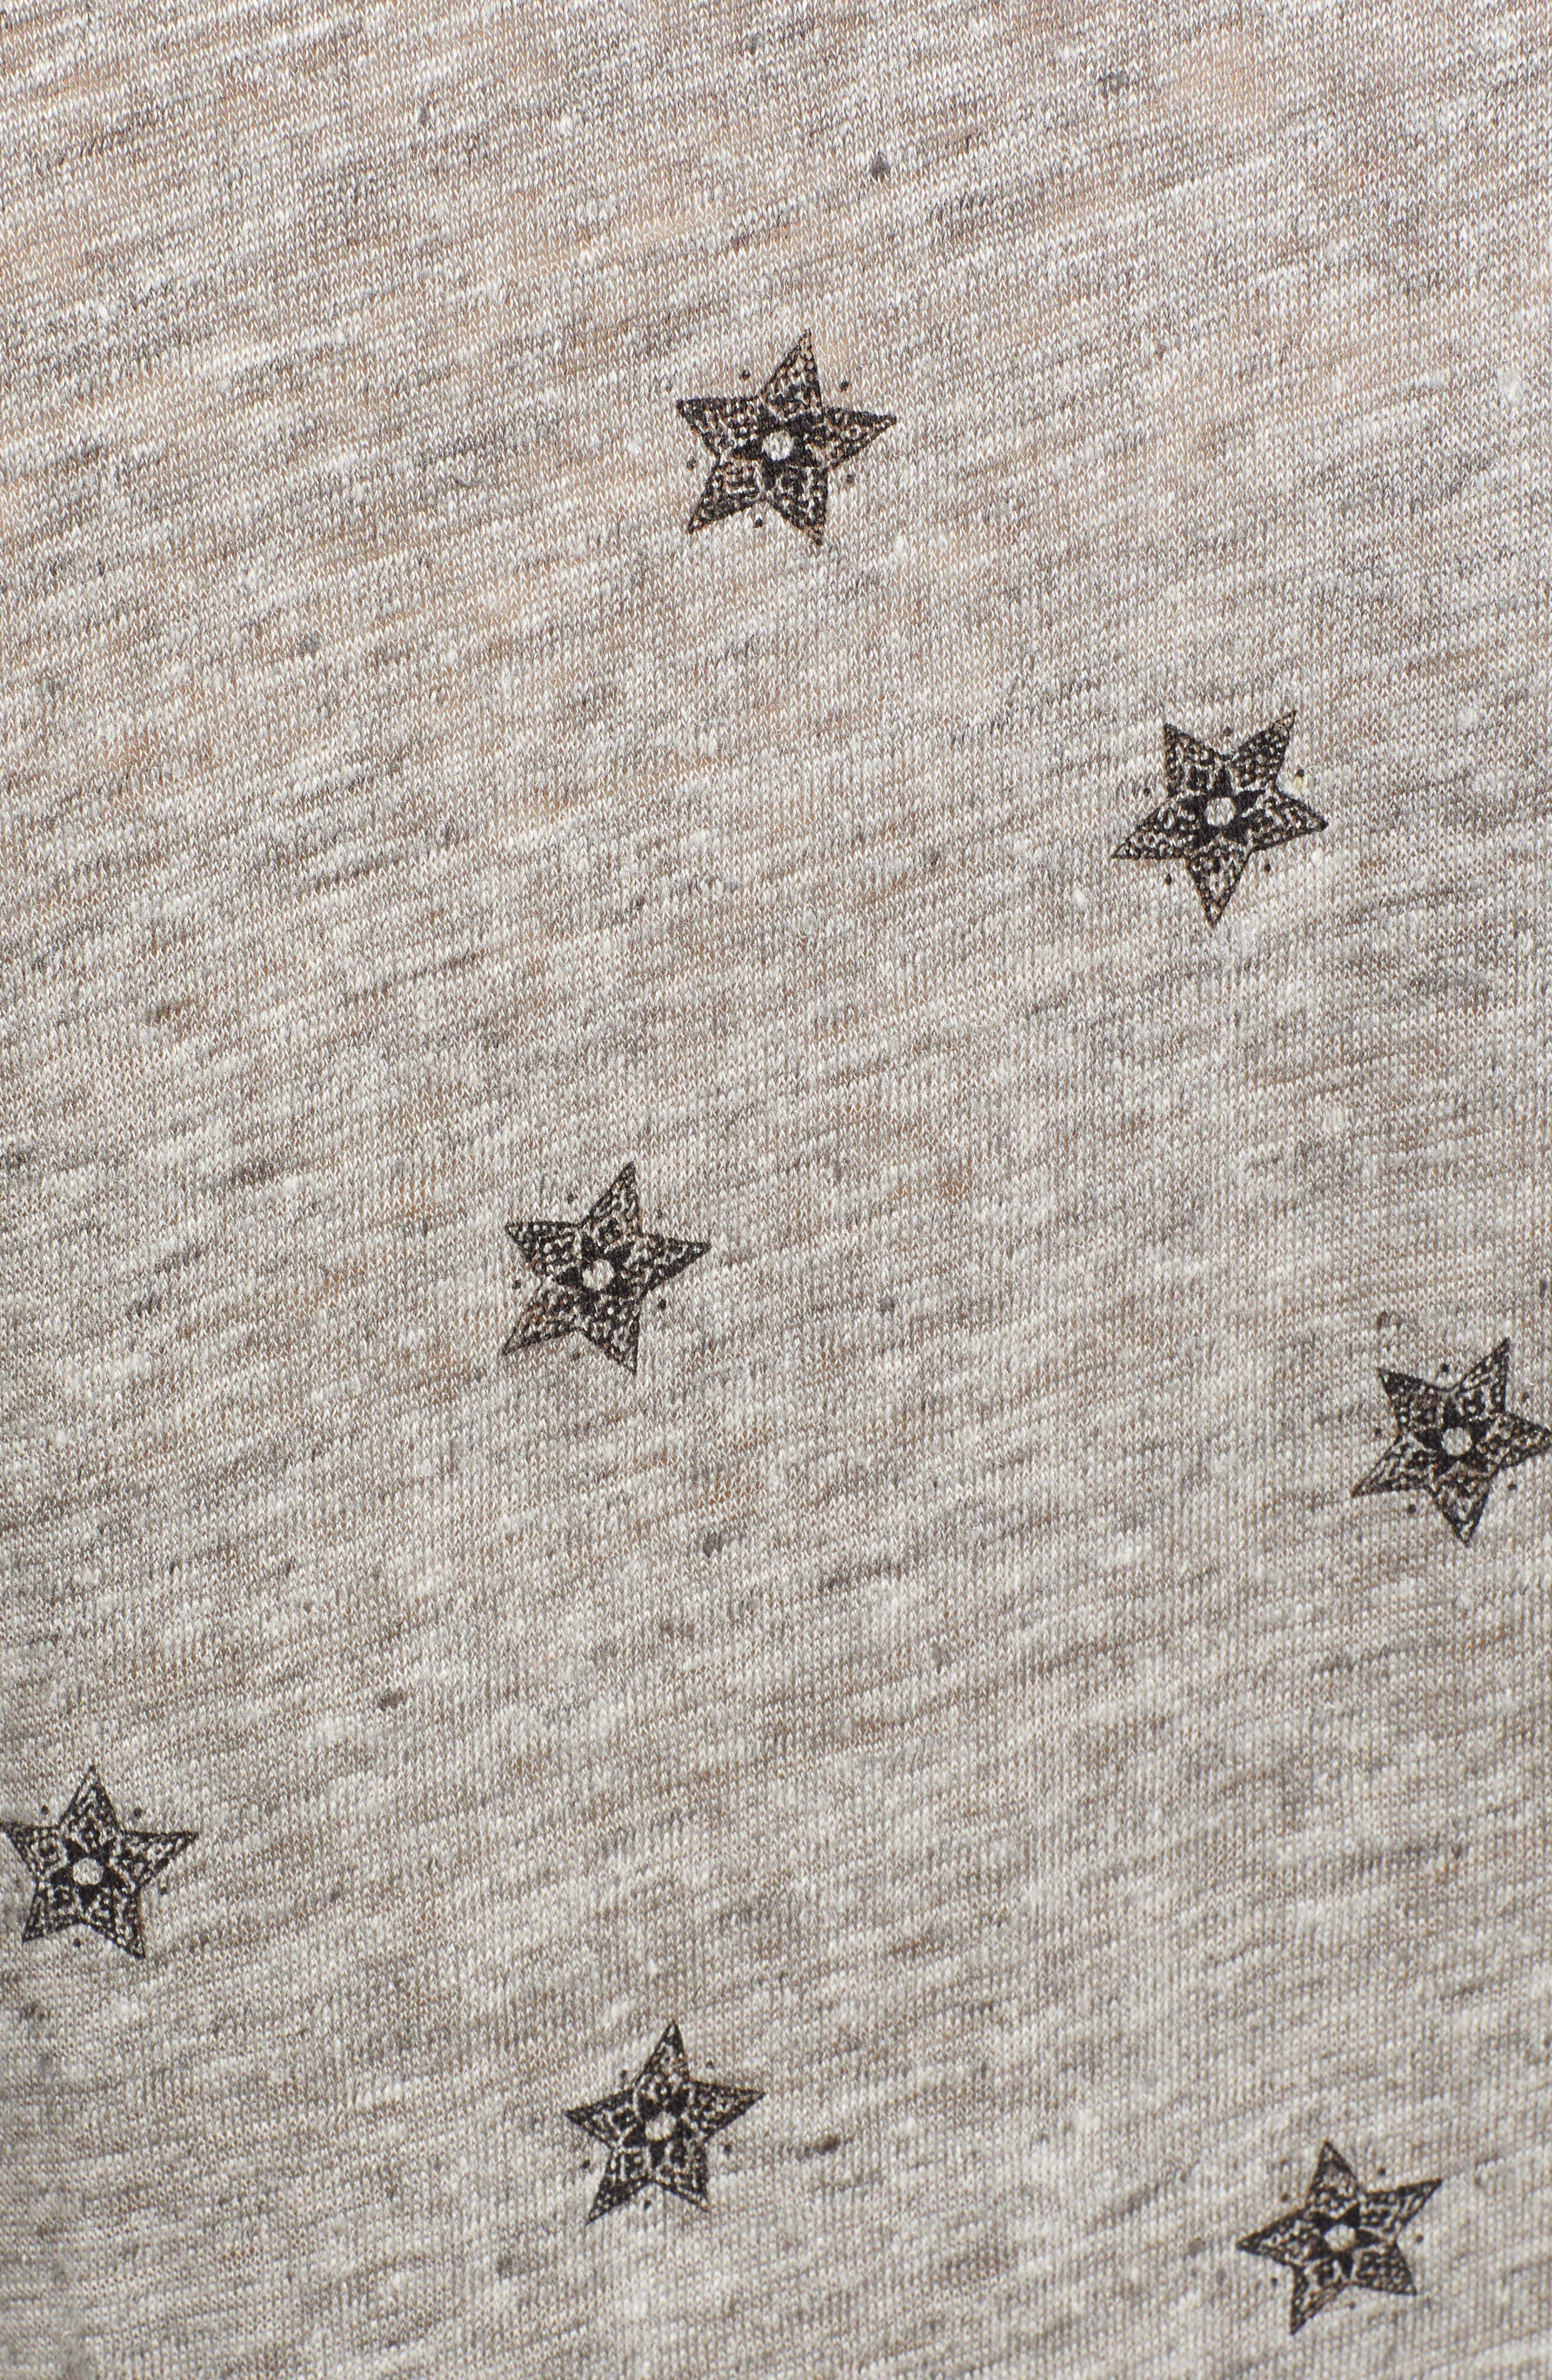 Cara V-Neck Slub Knit Tee,                             Alternate thumbnail 6, color,                             HEATHER GREY RIVET STAR